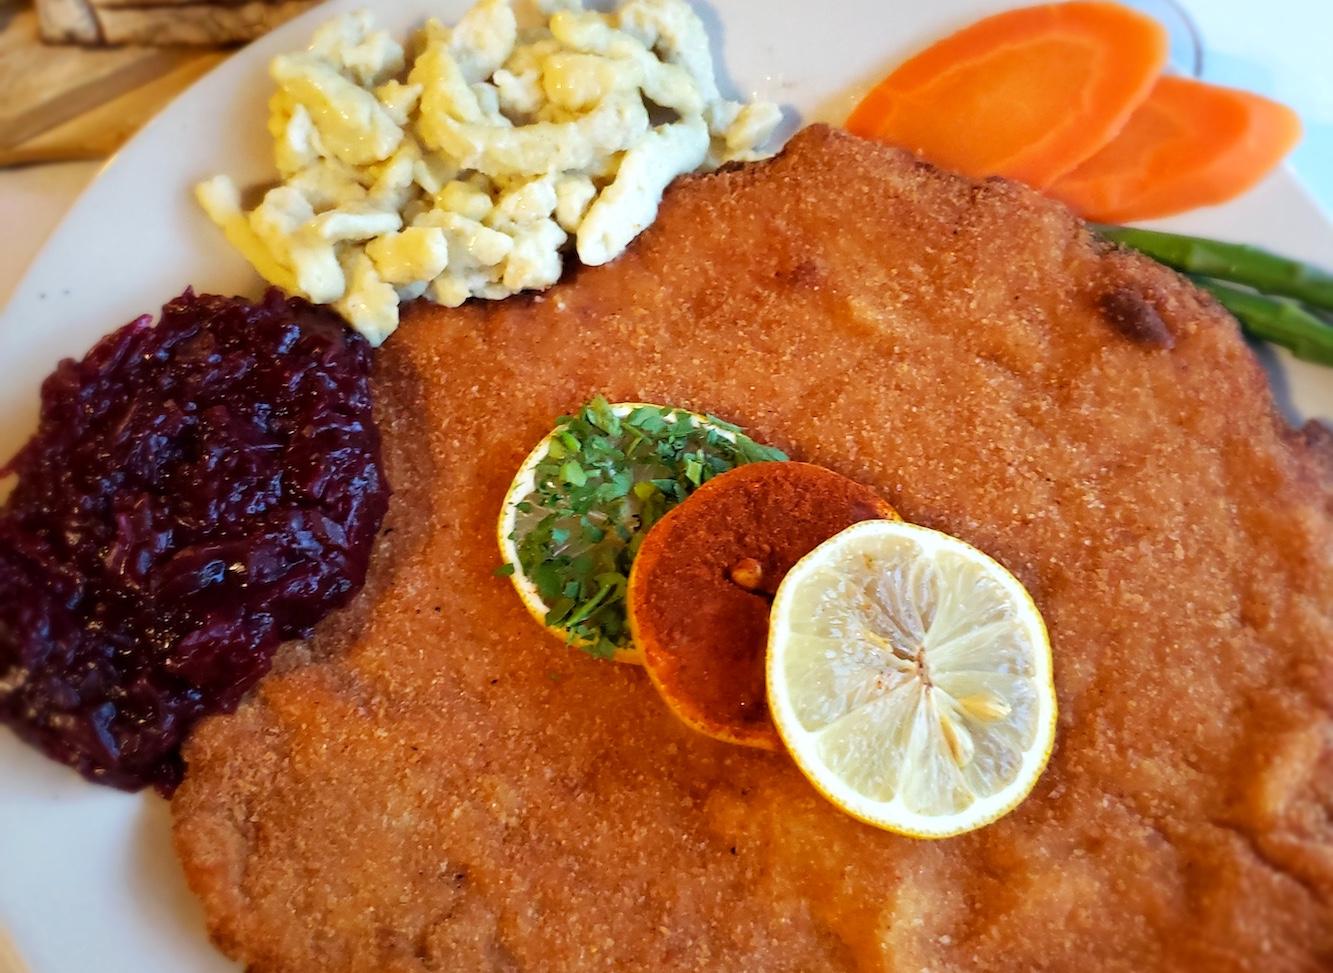 Al's Cafe Schnitzel VS. Elgin Public House Pork Belly Nachos